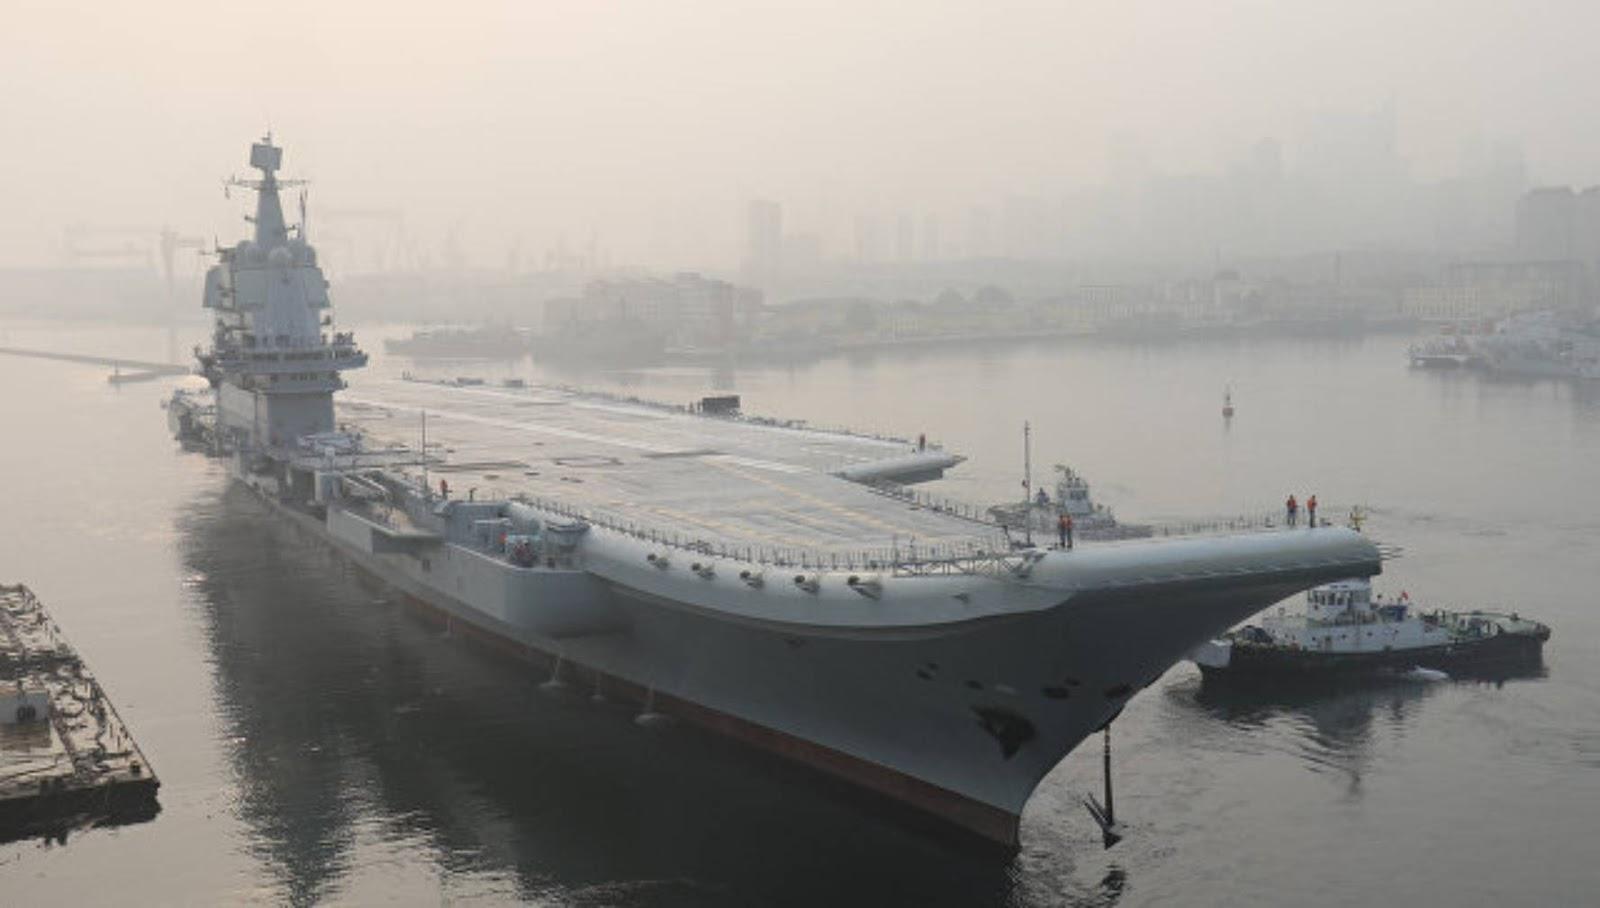 Dua kapal induk Cina akan berpartisipasi dalam latihan di Laut Kuning